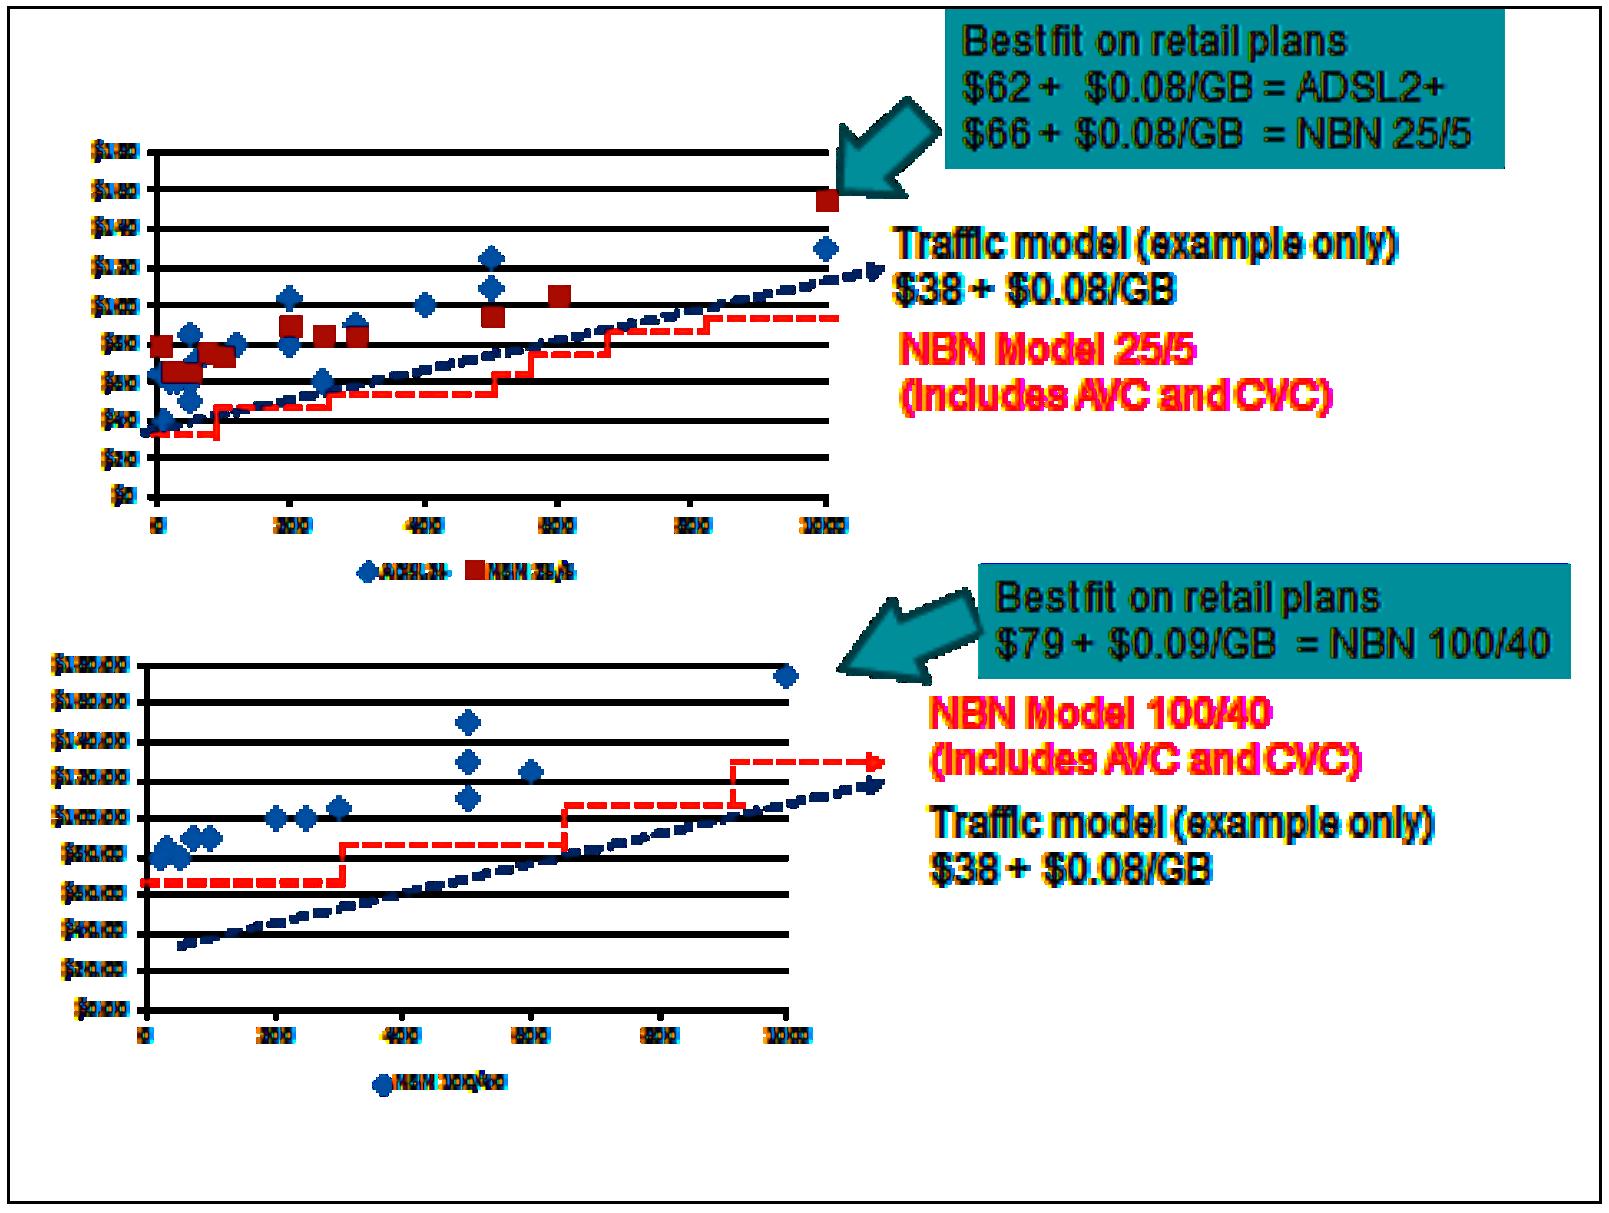 Figure 4. Retail Broadband Plans at September 2012